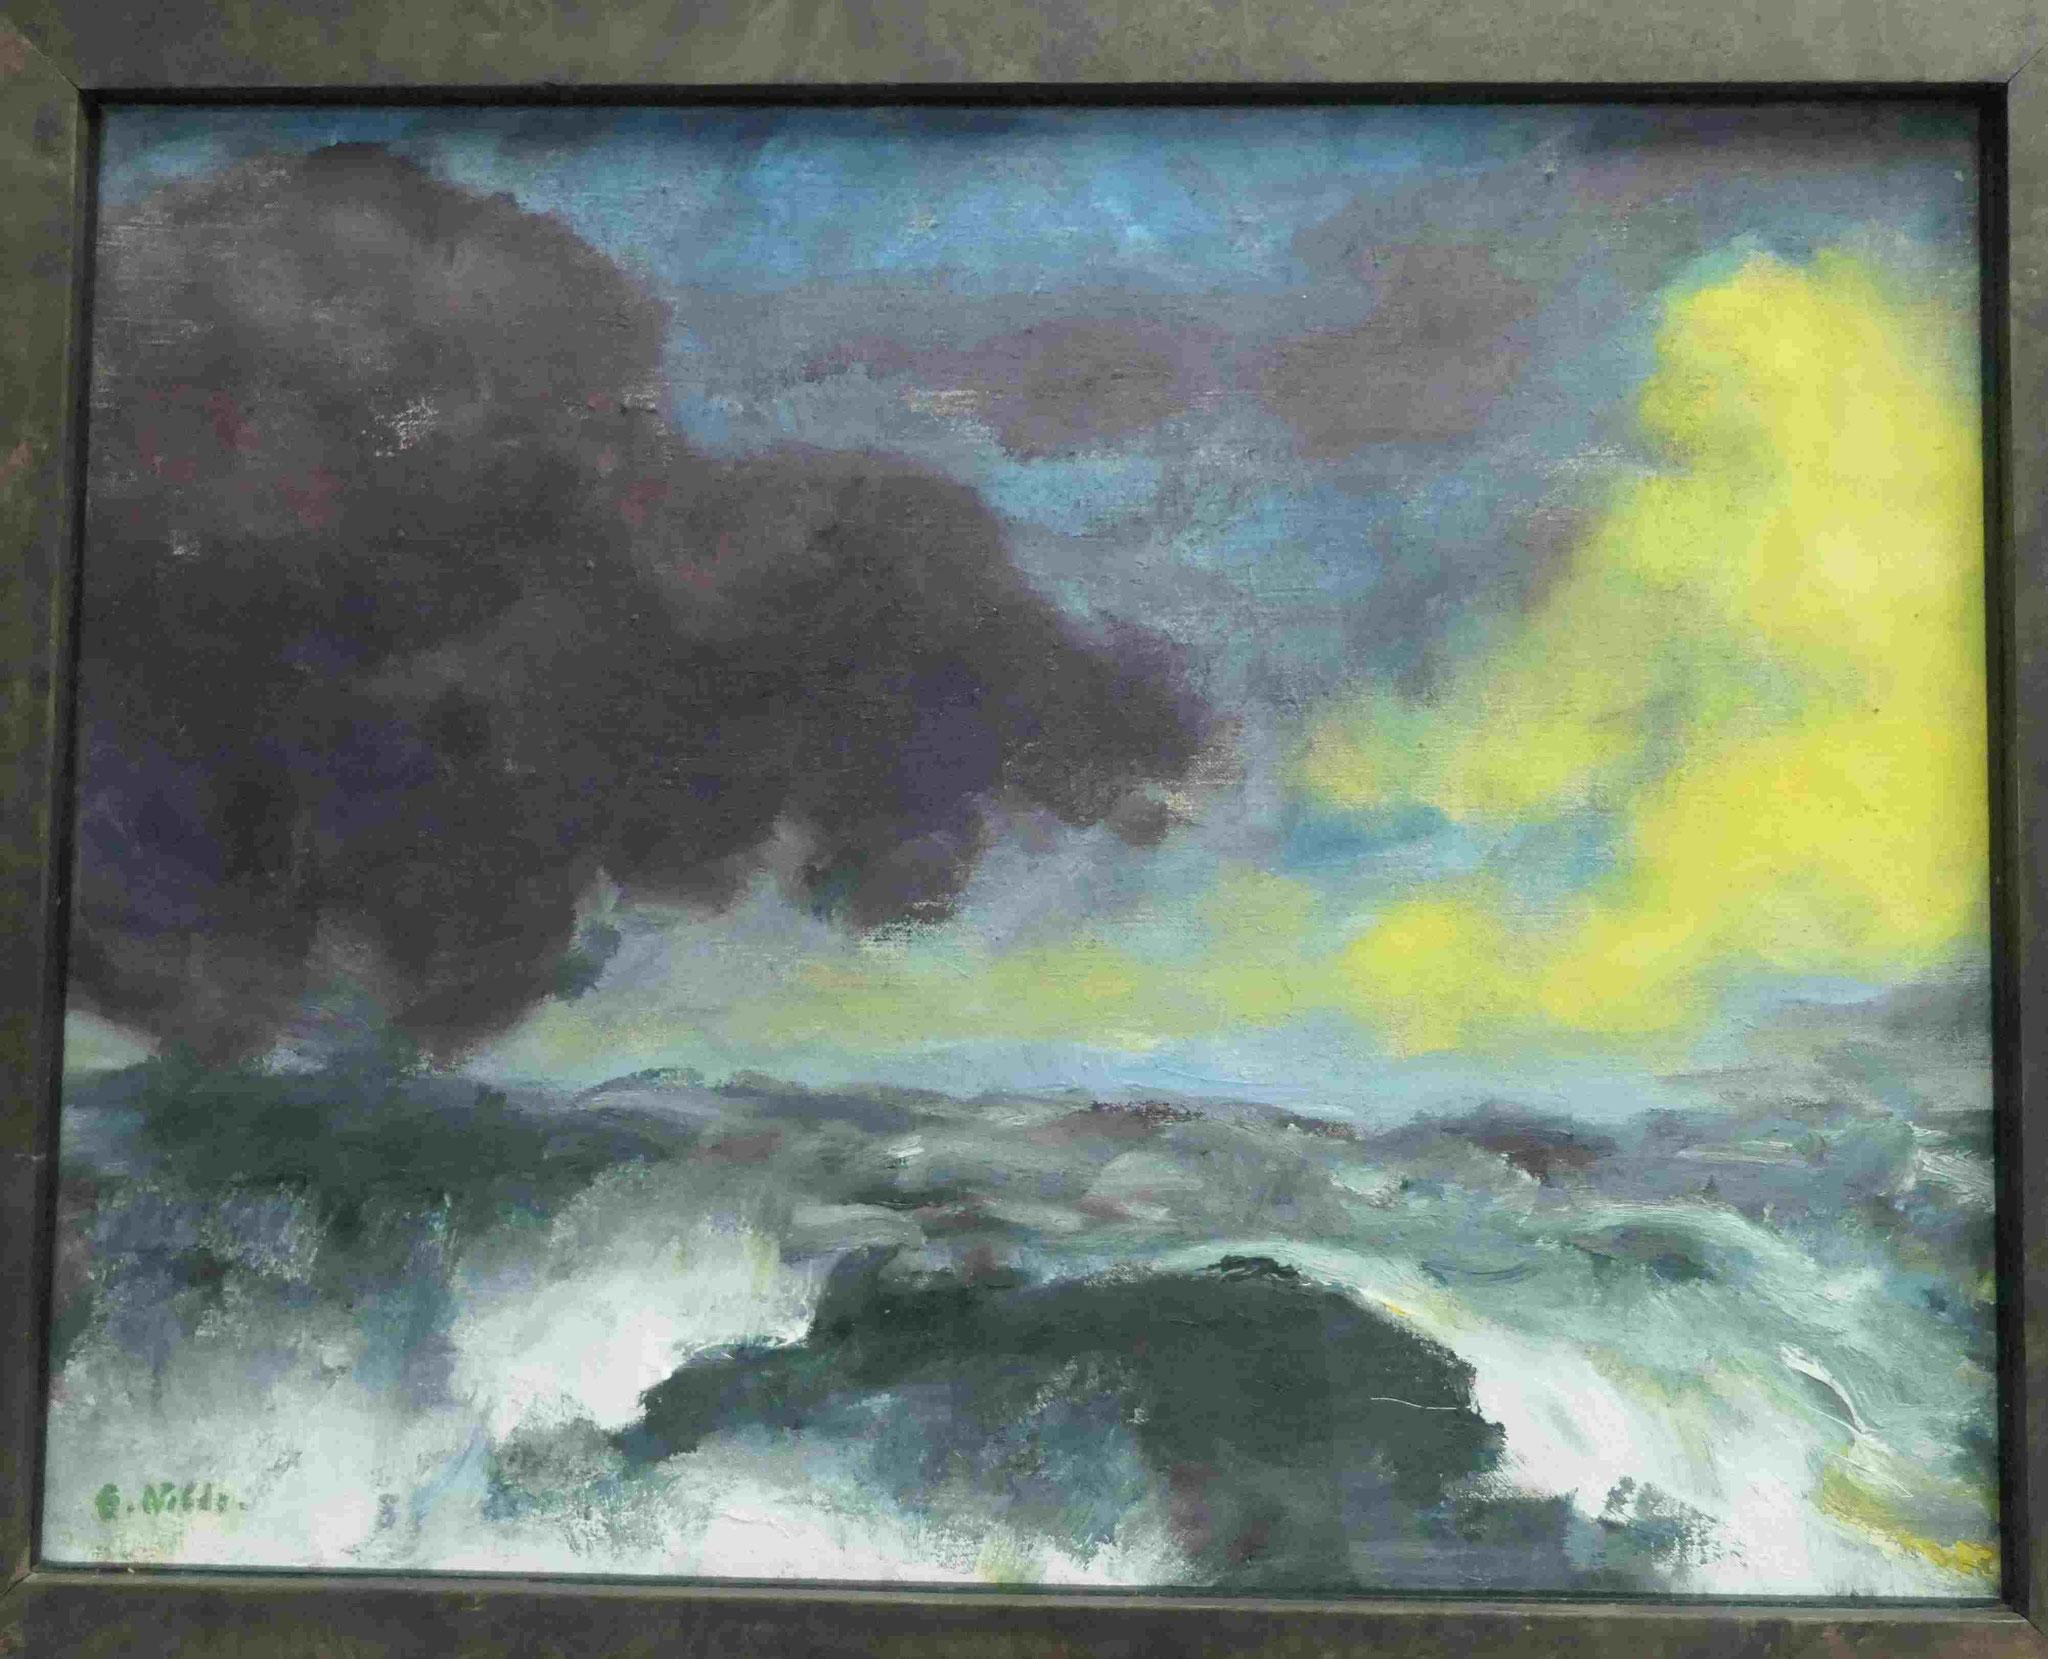 Emil Nolde, Bewegtes Meer, 1948, Kunsthalle zu Kiel